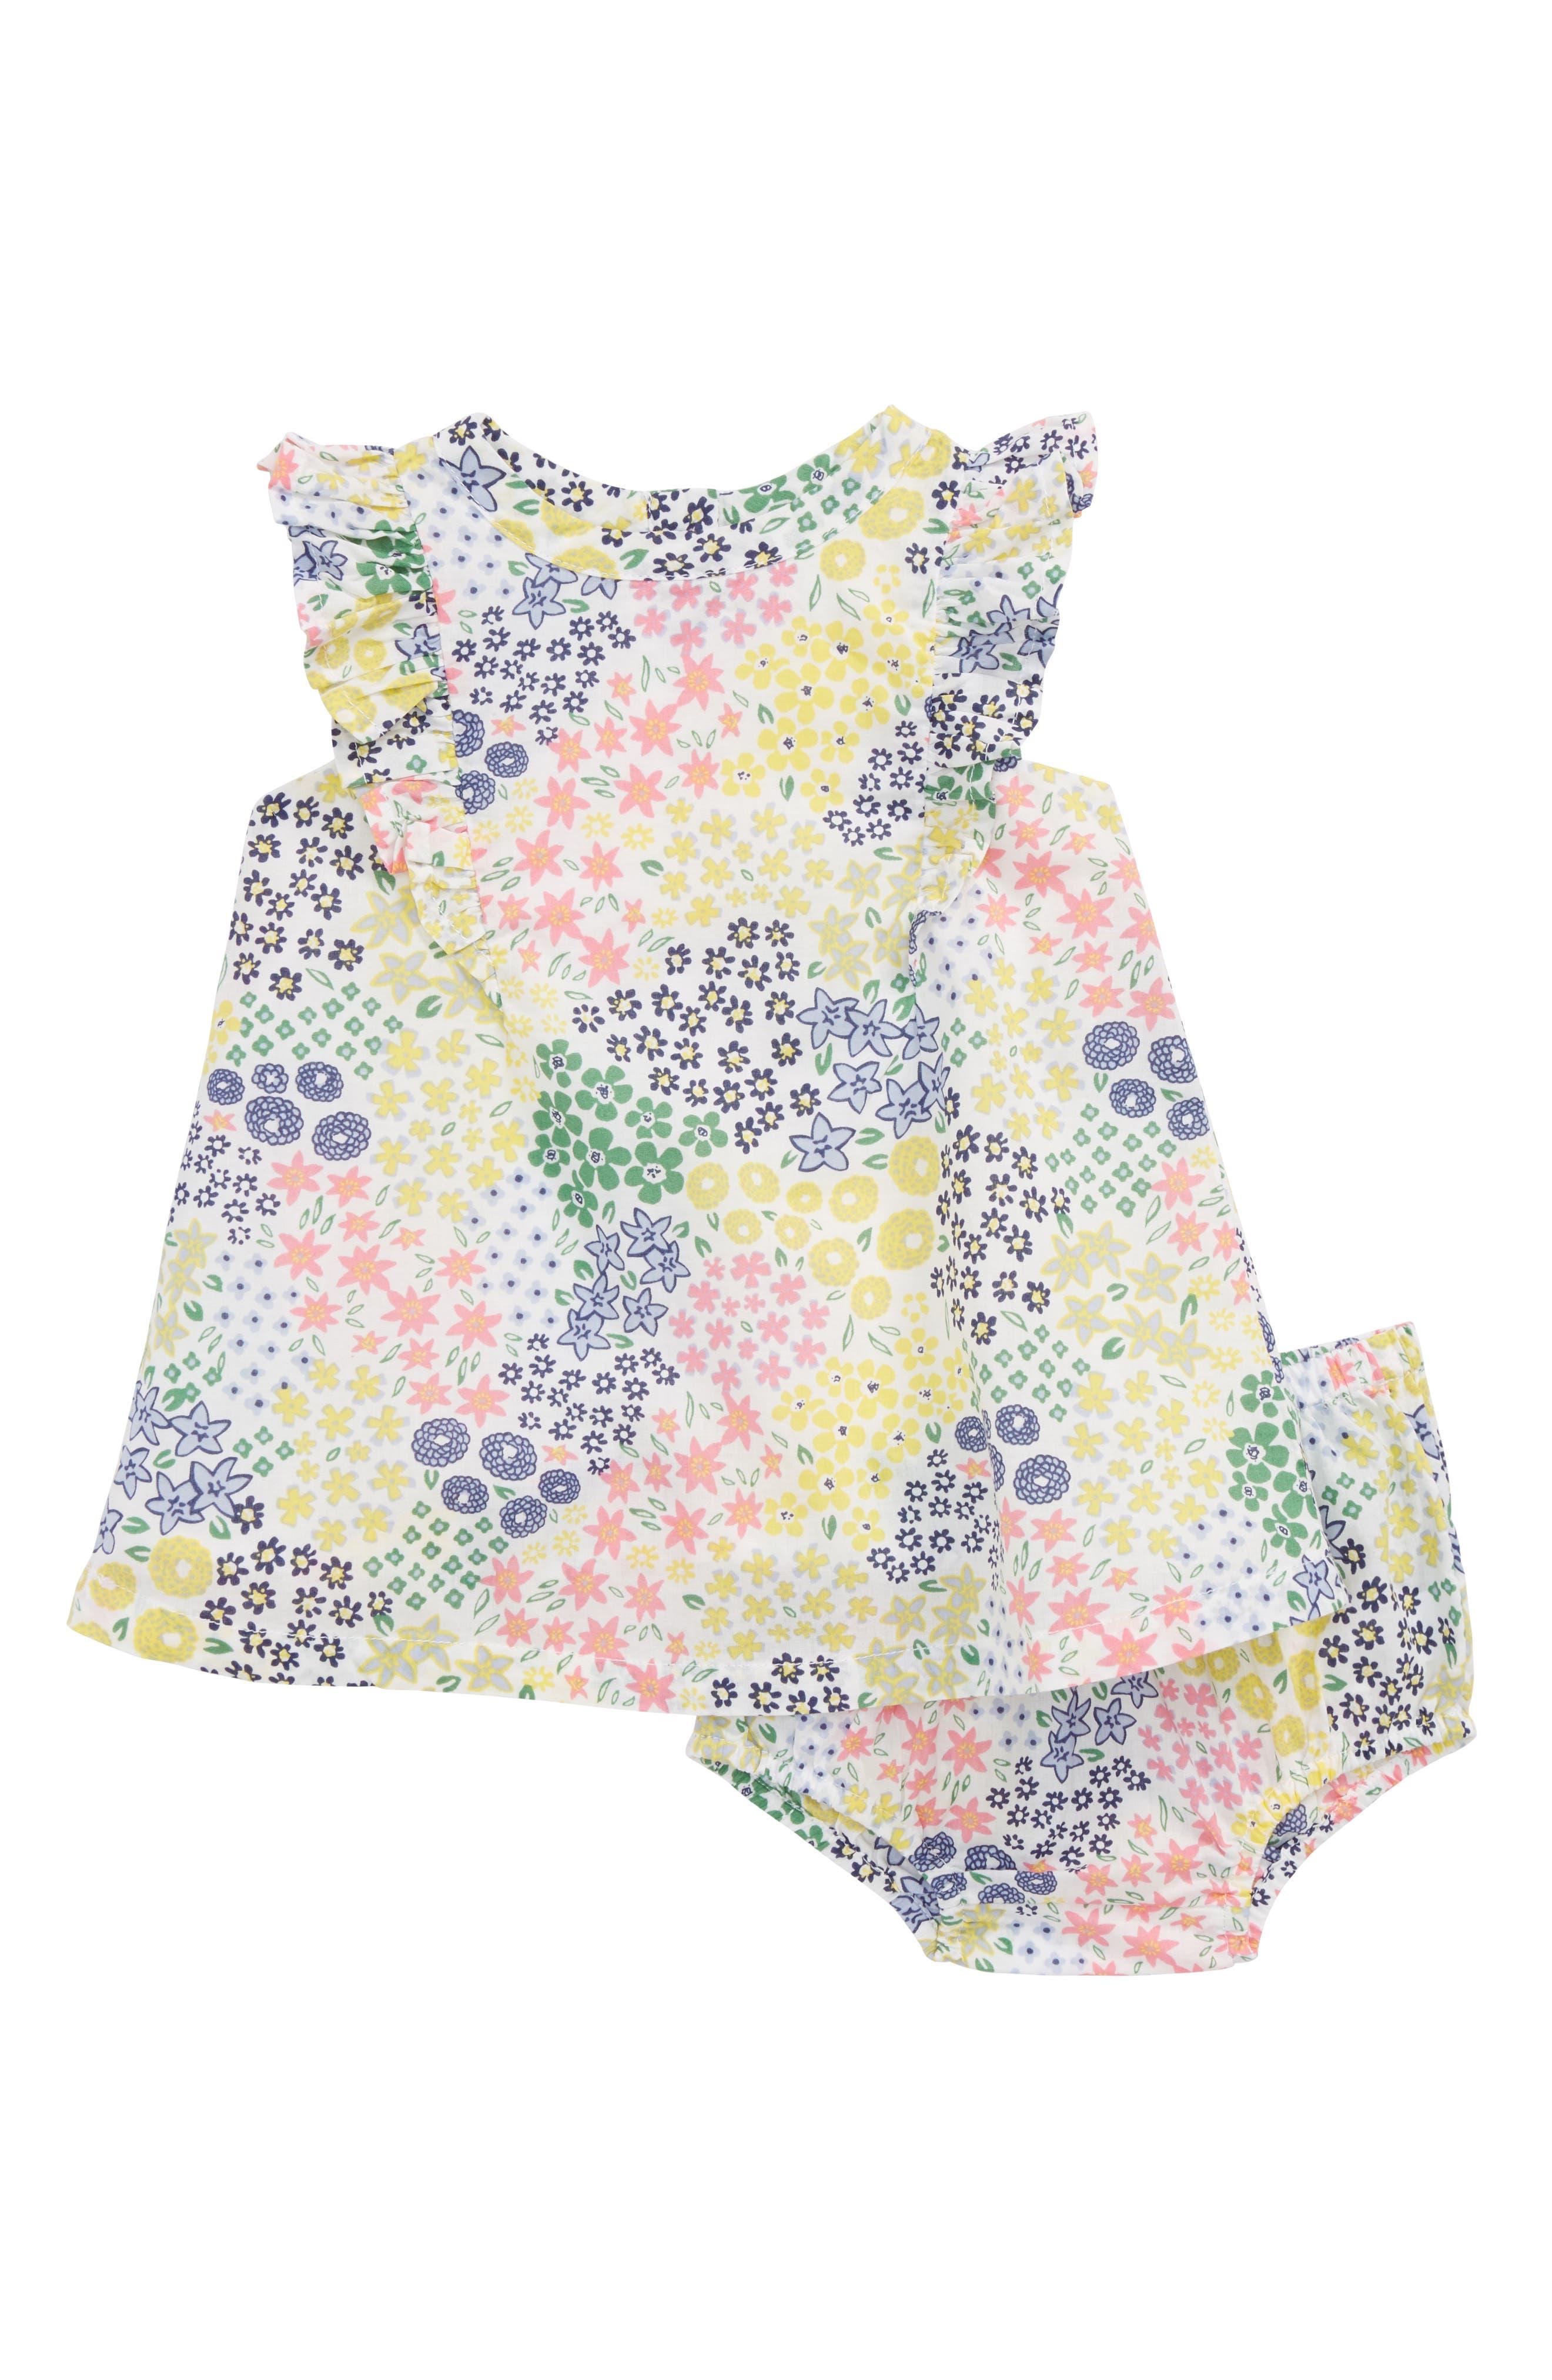 Ruffle Floral Dress,                             Main thumbnail 1, color,                             White Multi Meadow